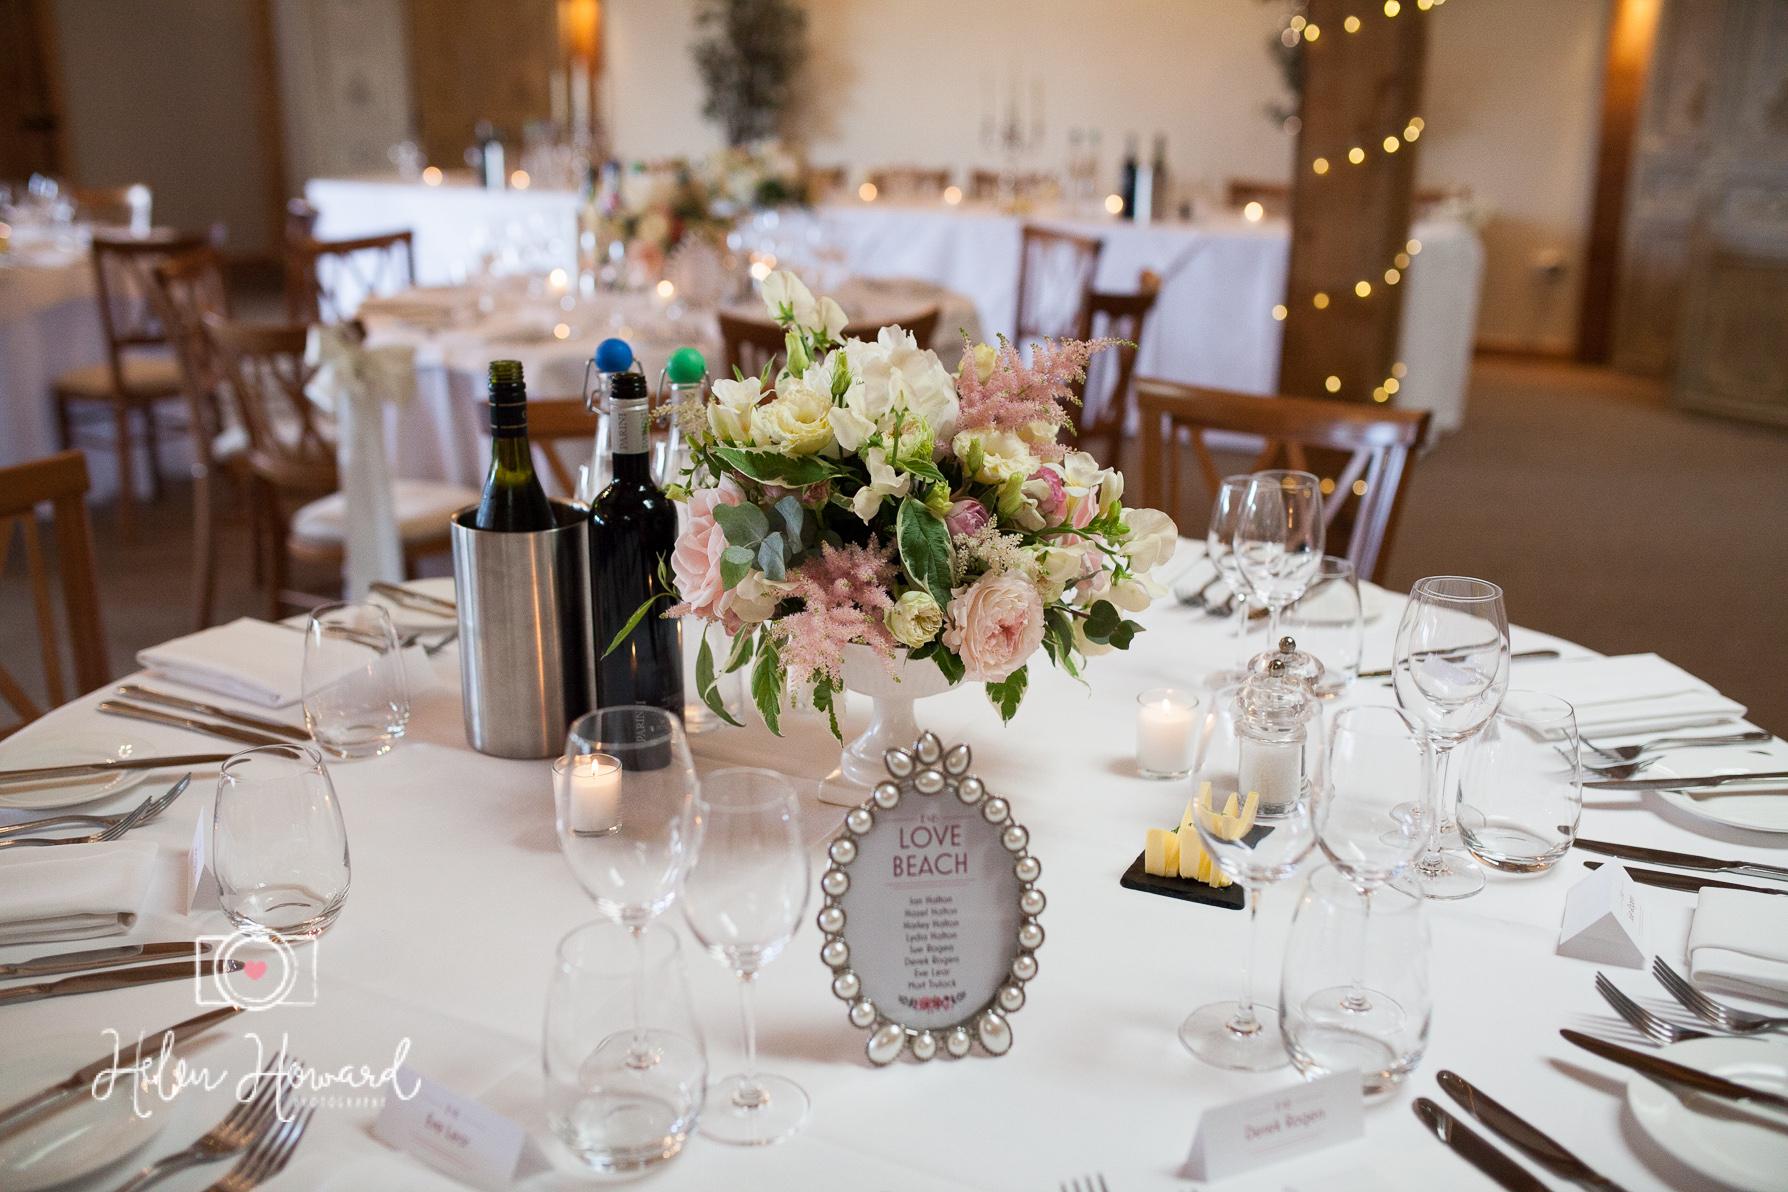 Helen Howard Photography Packington Moor Wedding-85.jpg